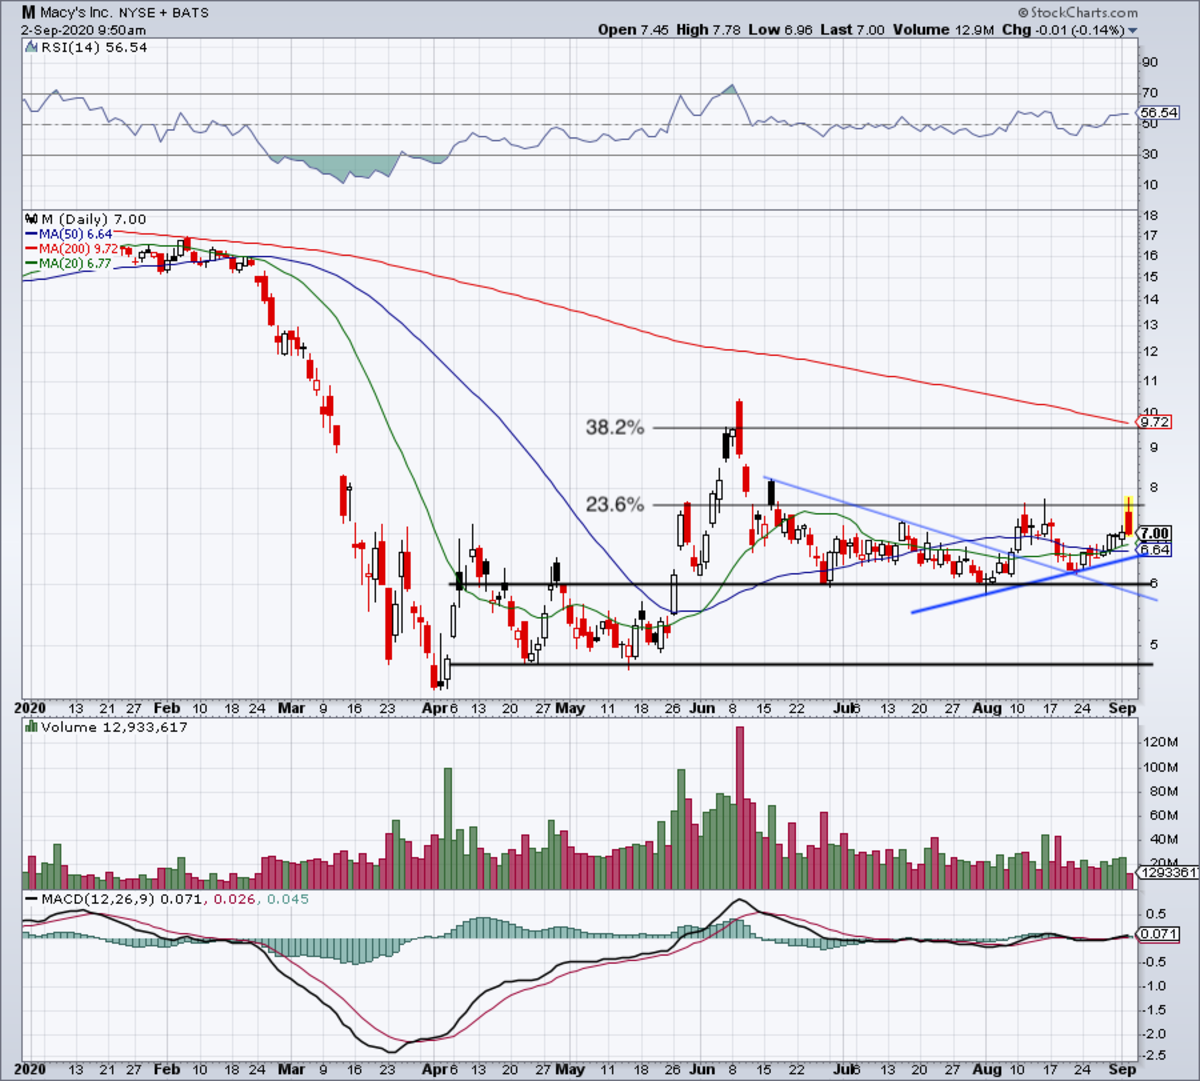 Daily chart of Macy's stock.